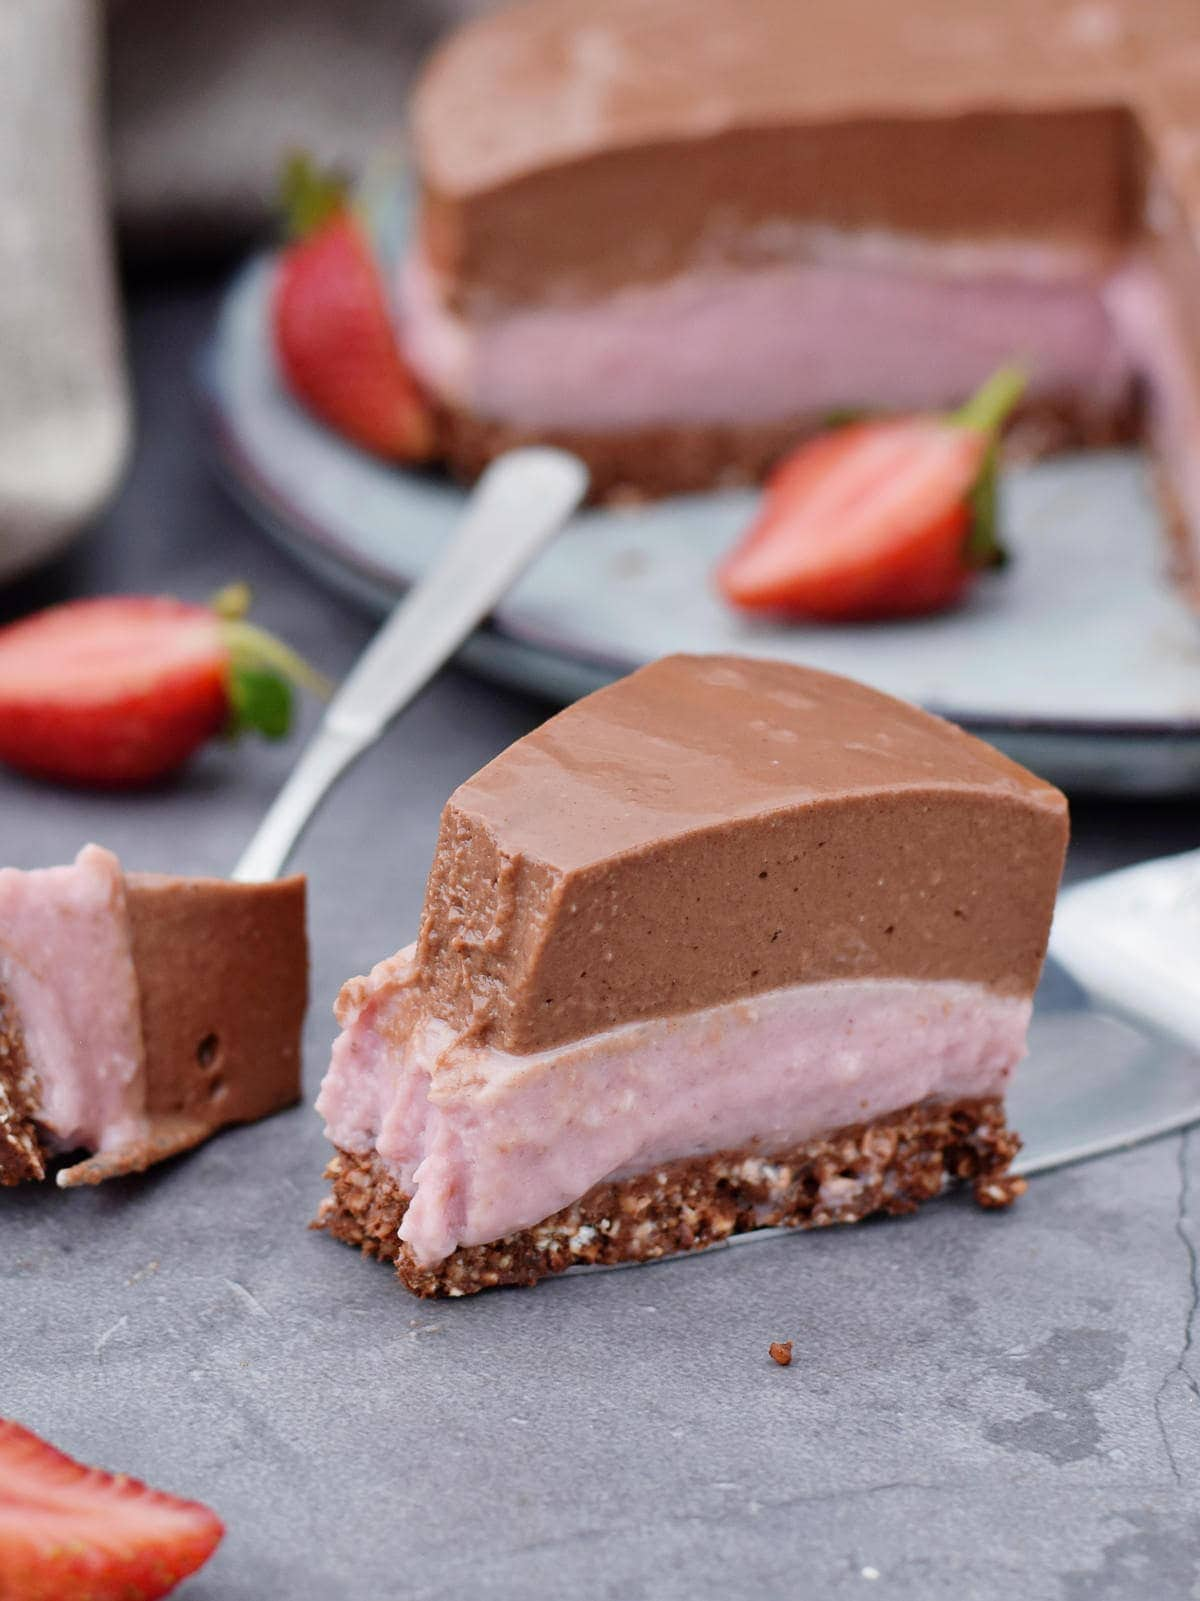 eating one piece of vegan chocolate strawberry cheesecake